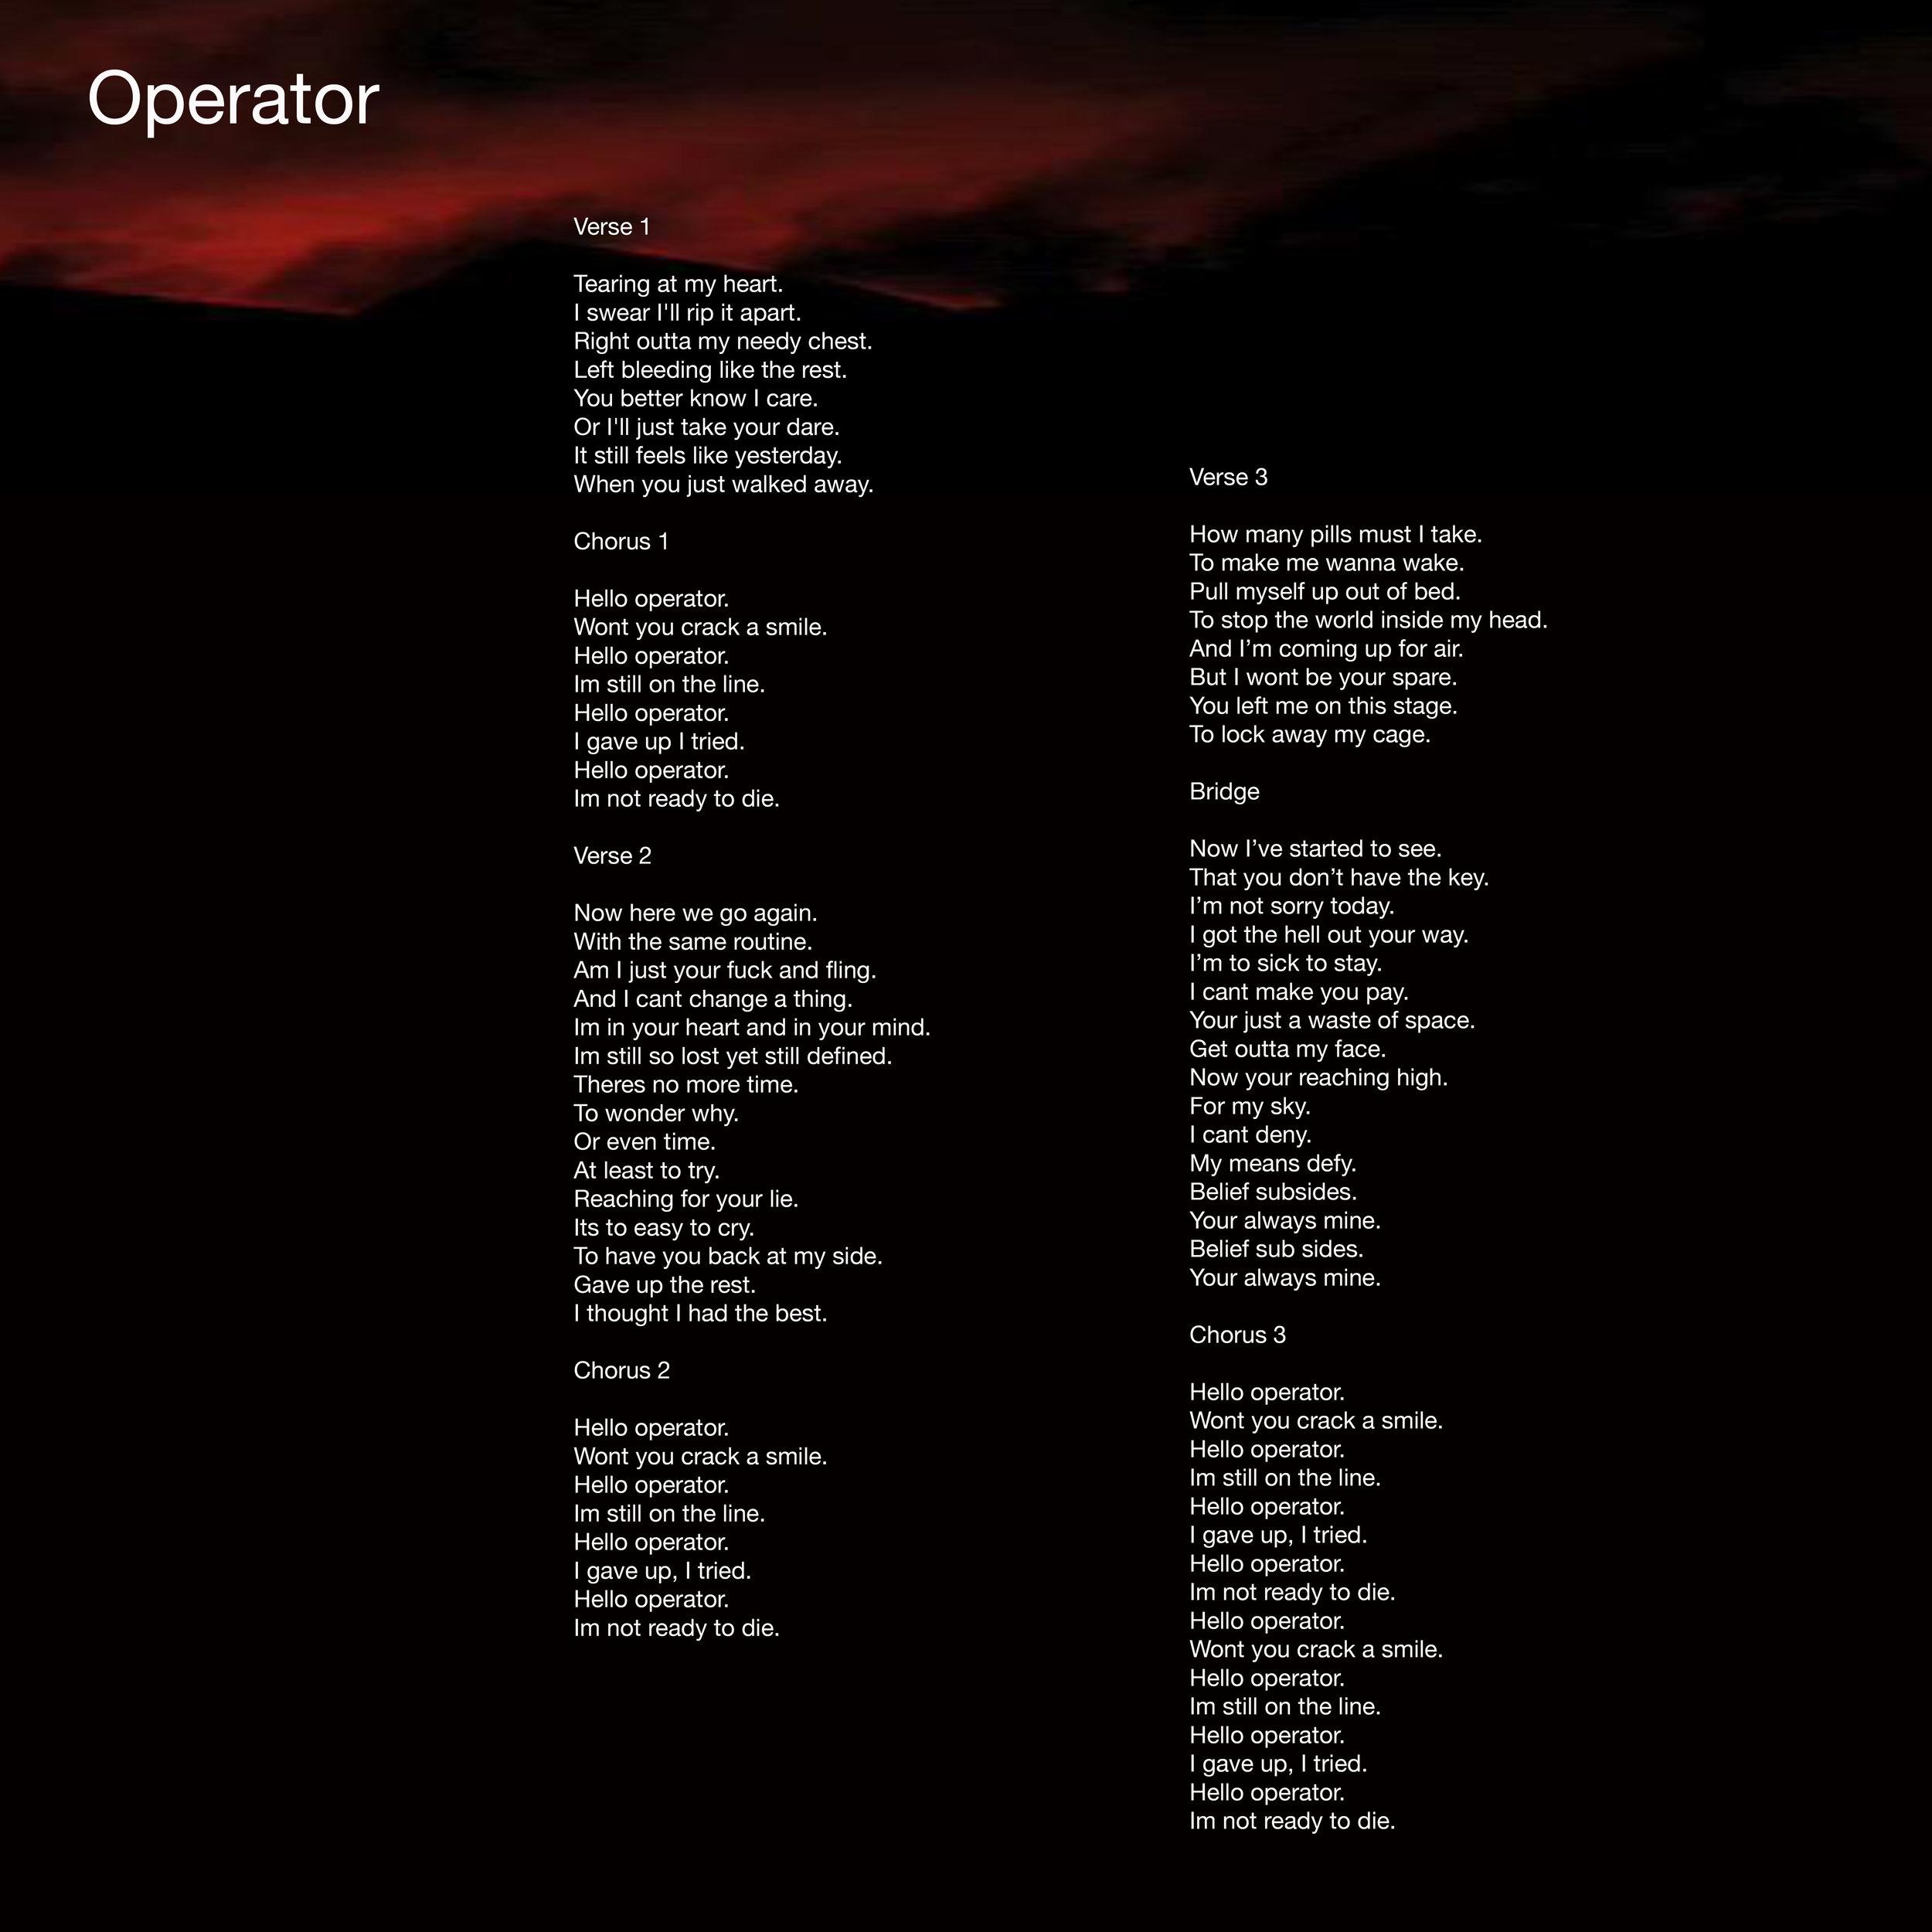 operator-lyrics-artDX.jpg